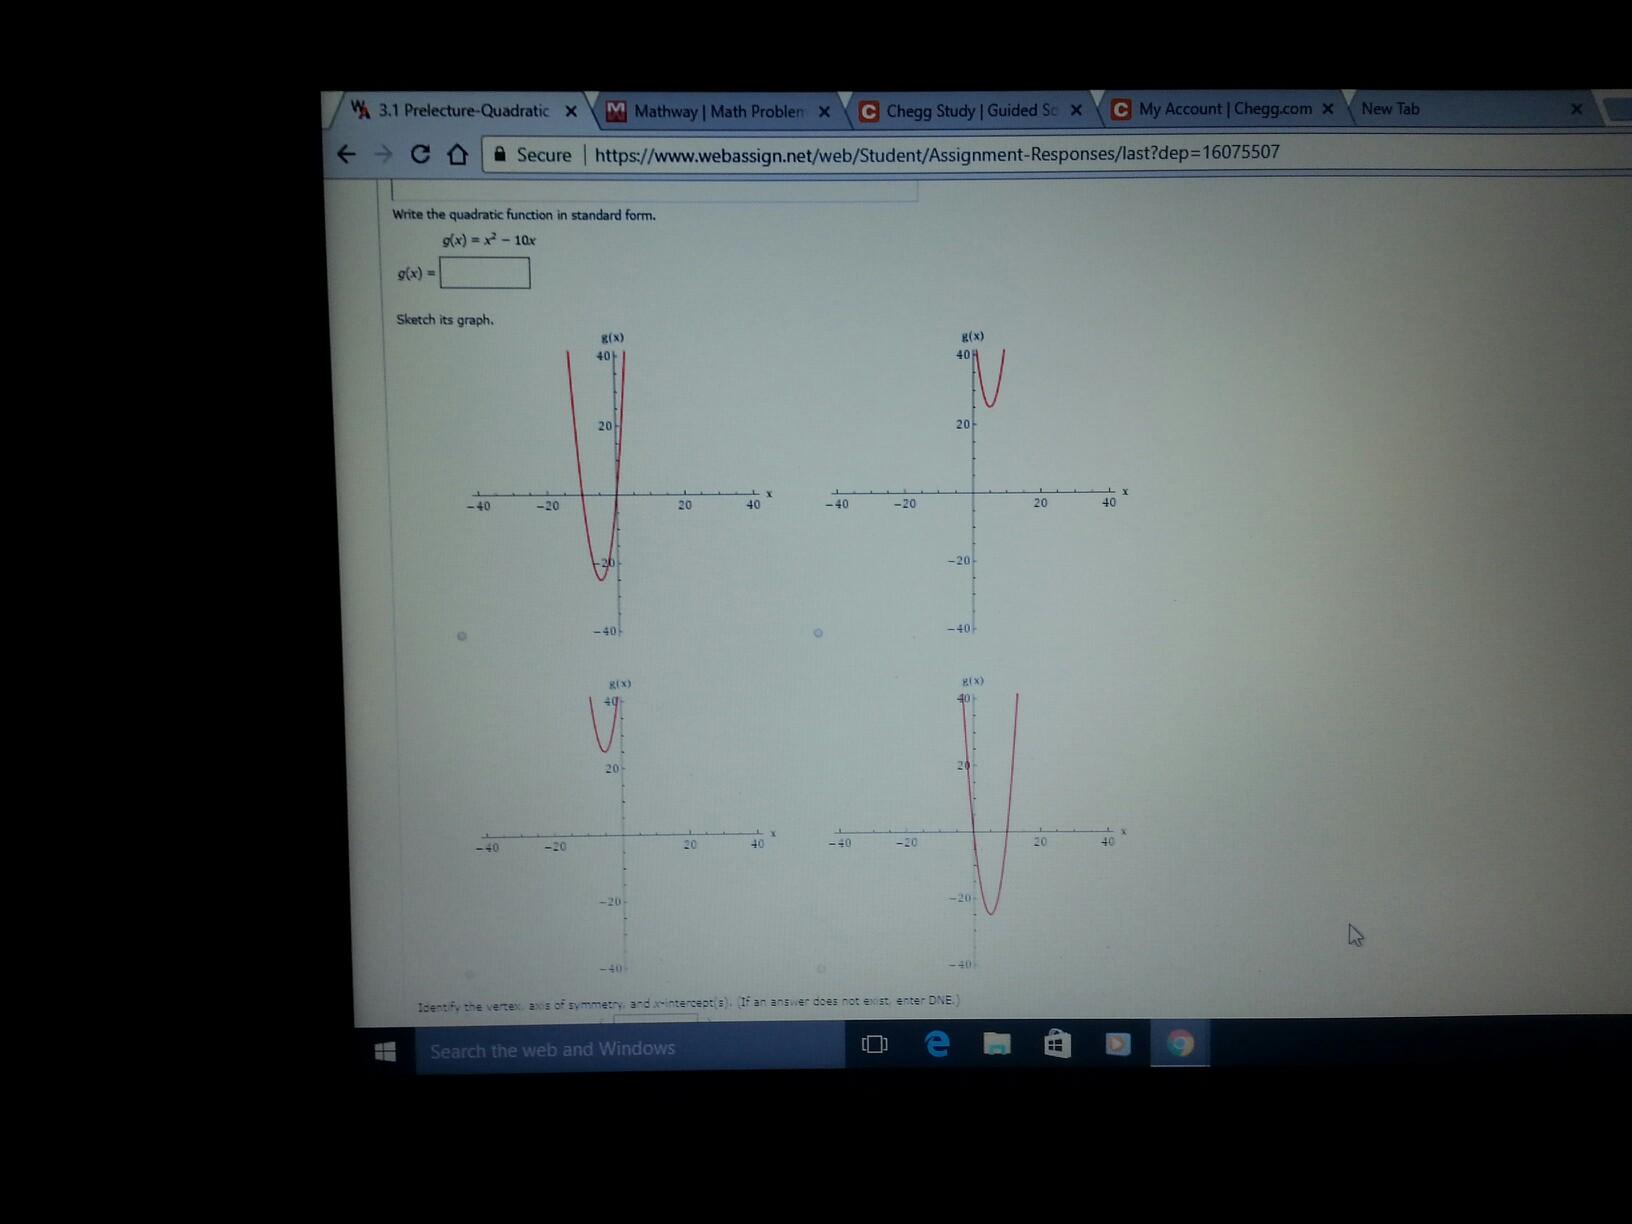 Solved: W 3,1 Prelecture-Quadra X M Mathway L Math Problem ...